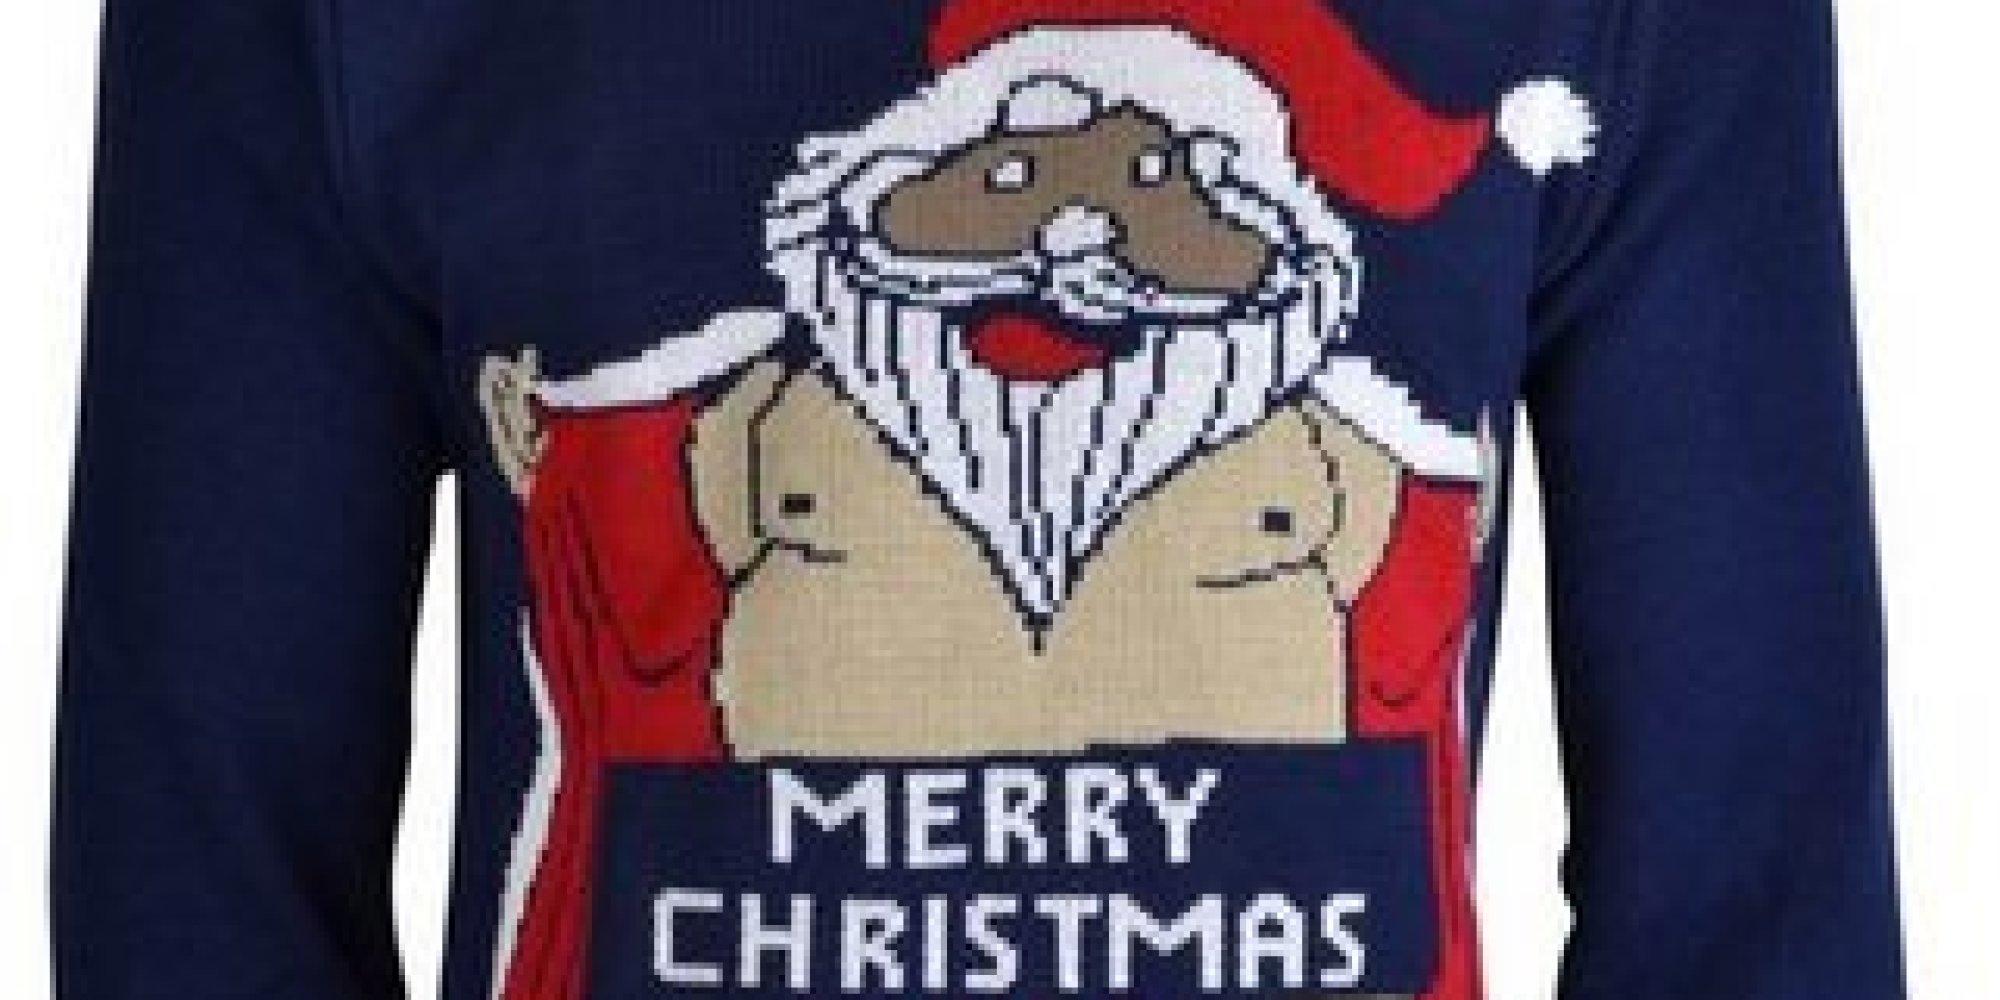 Naughty Christmas Sweaters